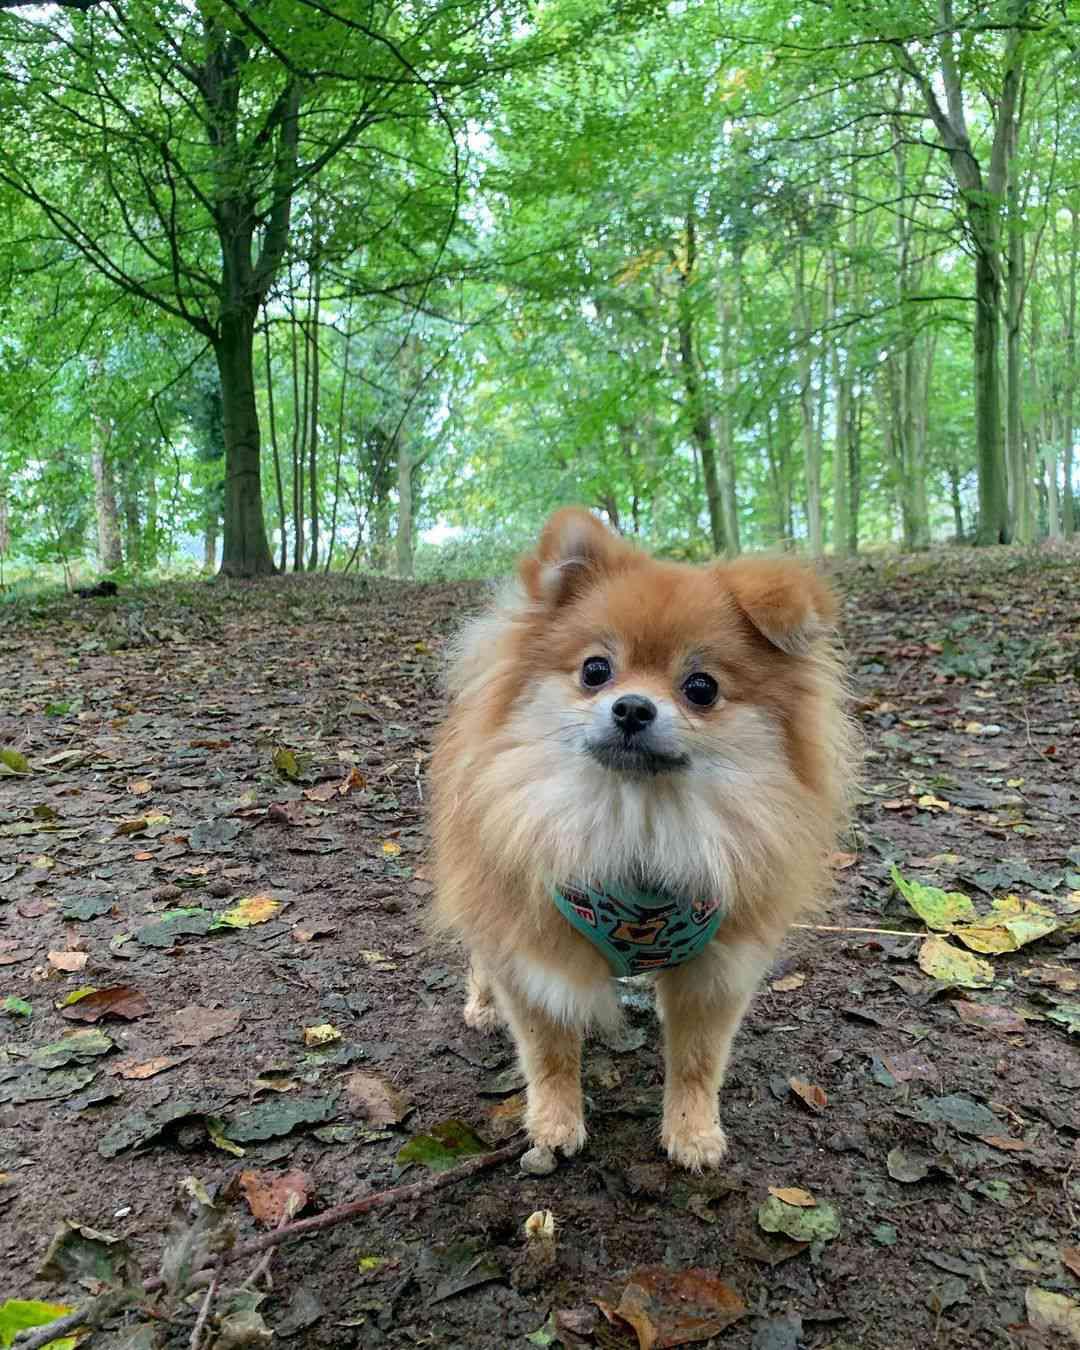 A little tan pomeranian standing in the woods.